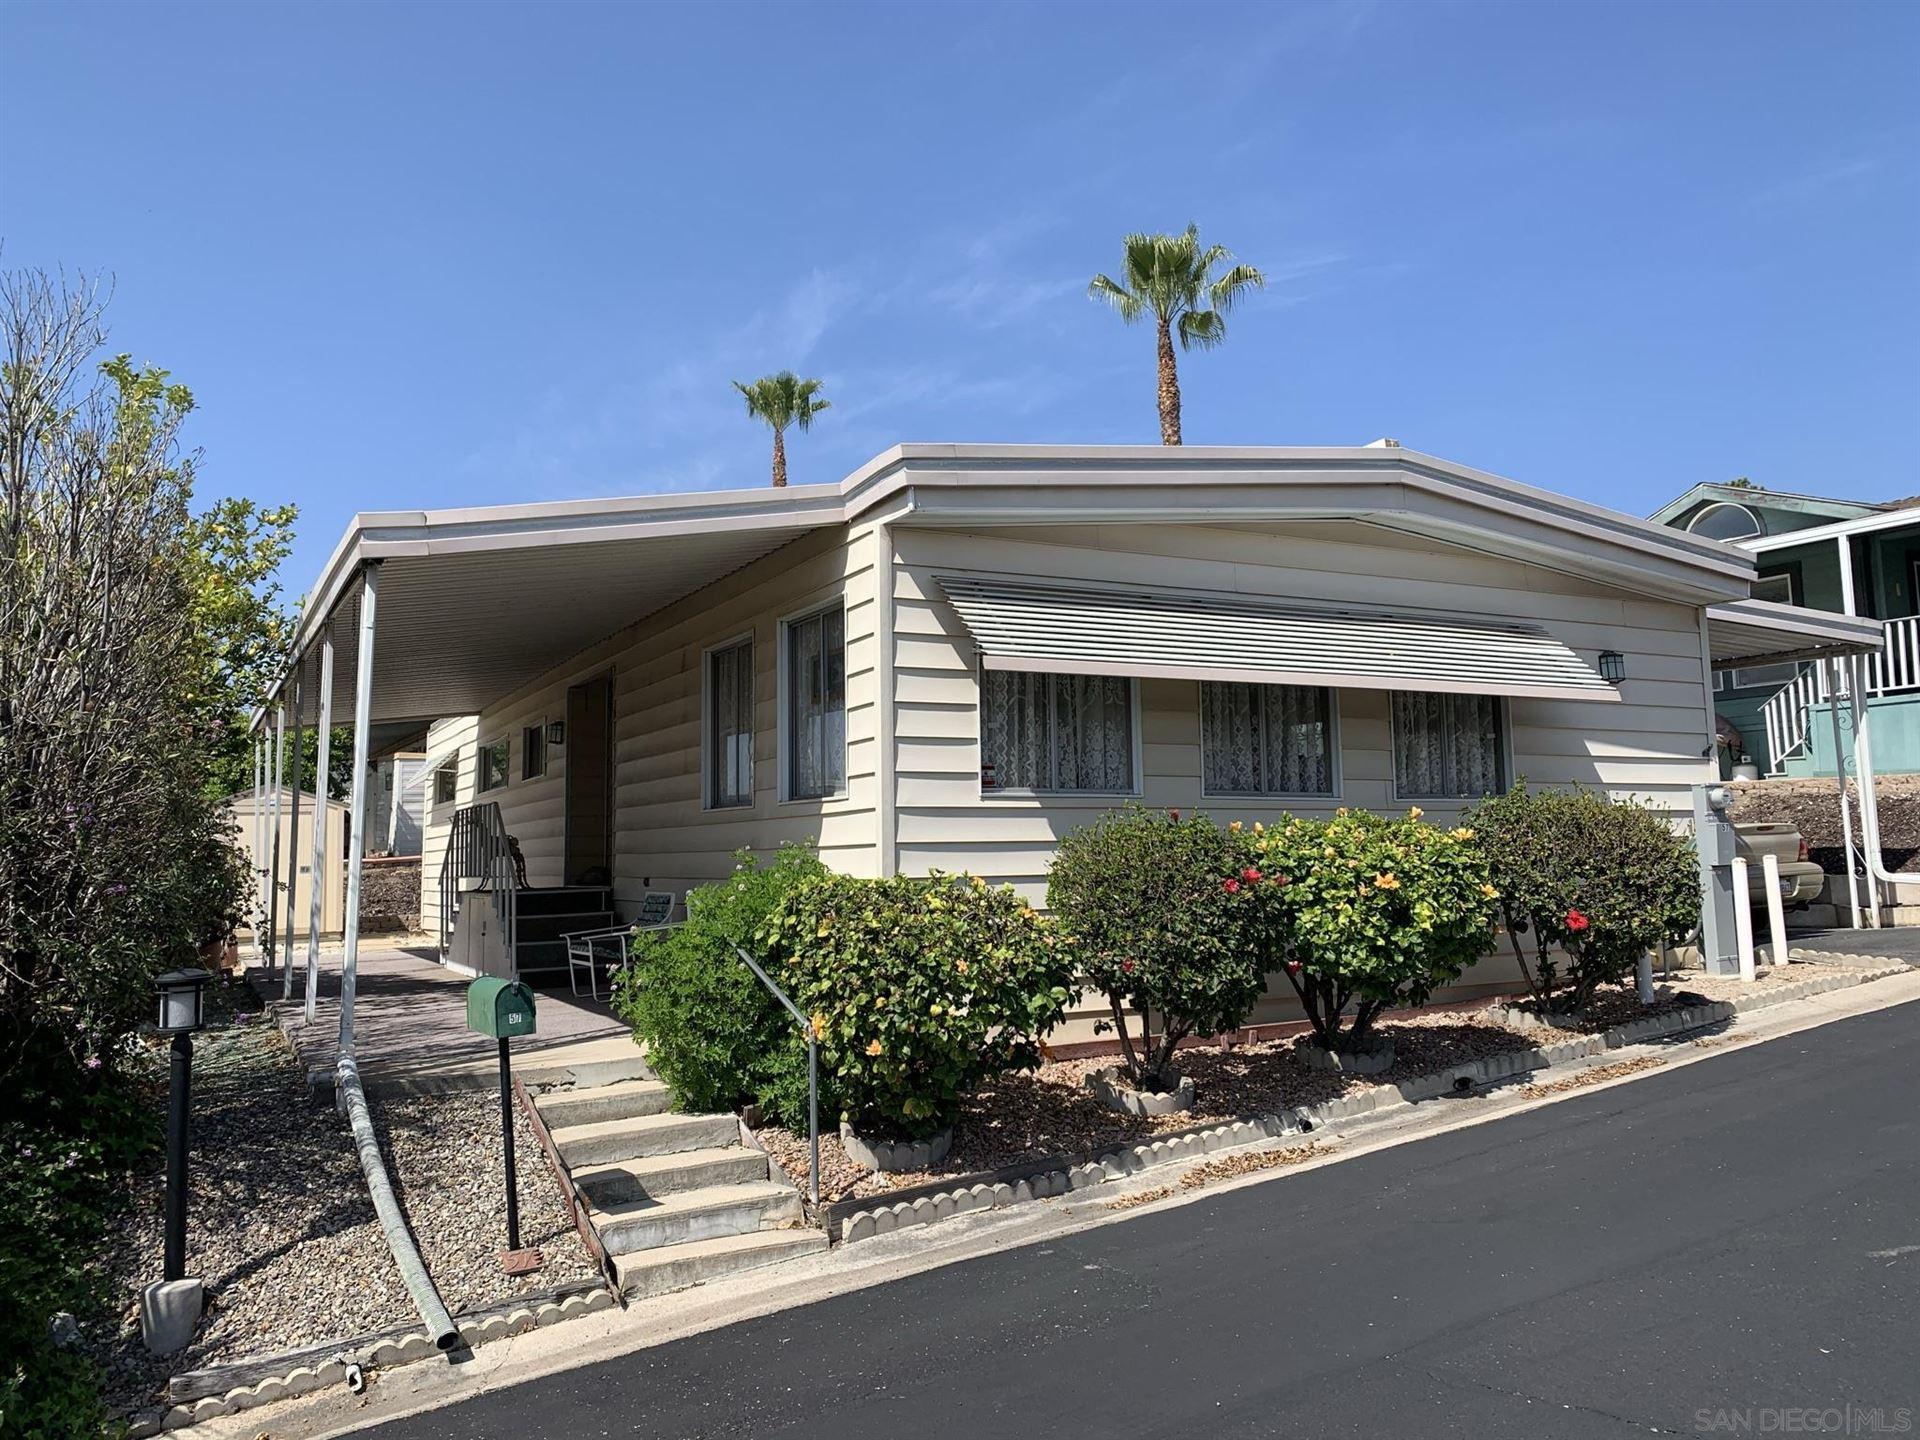 Photo of 10770 Jamacha Blvd. #57, Spring Valley, CA 91978 (MLS # 210015741)